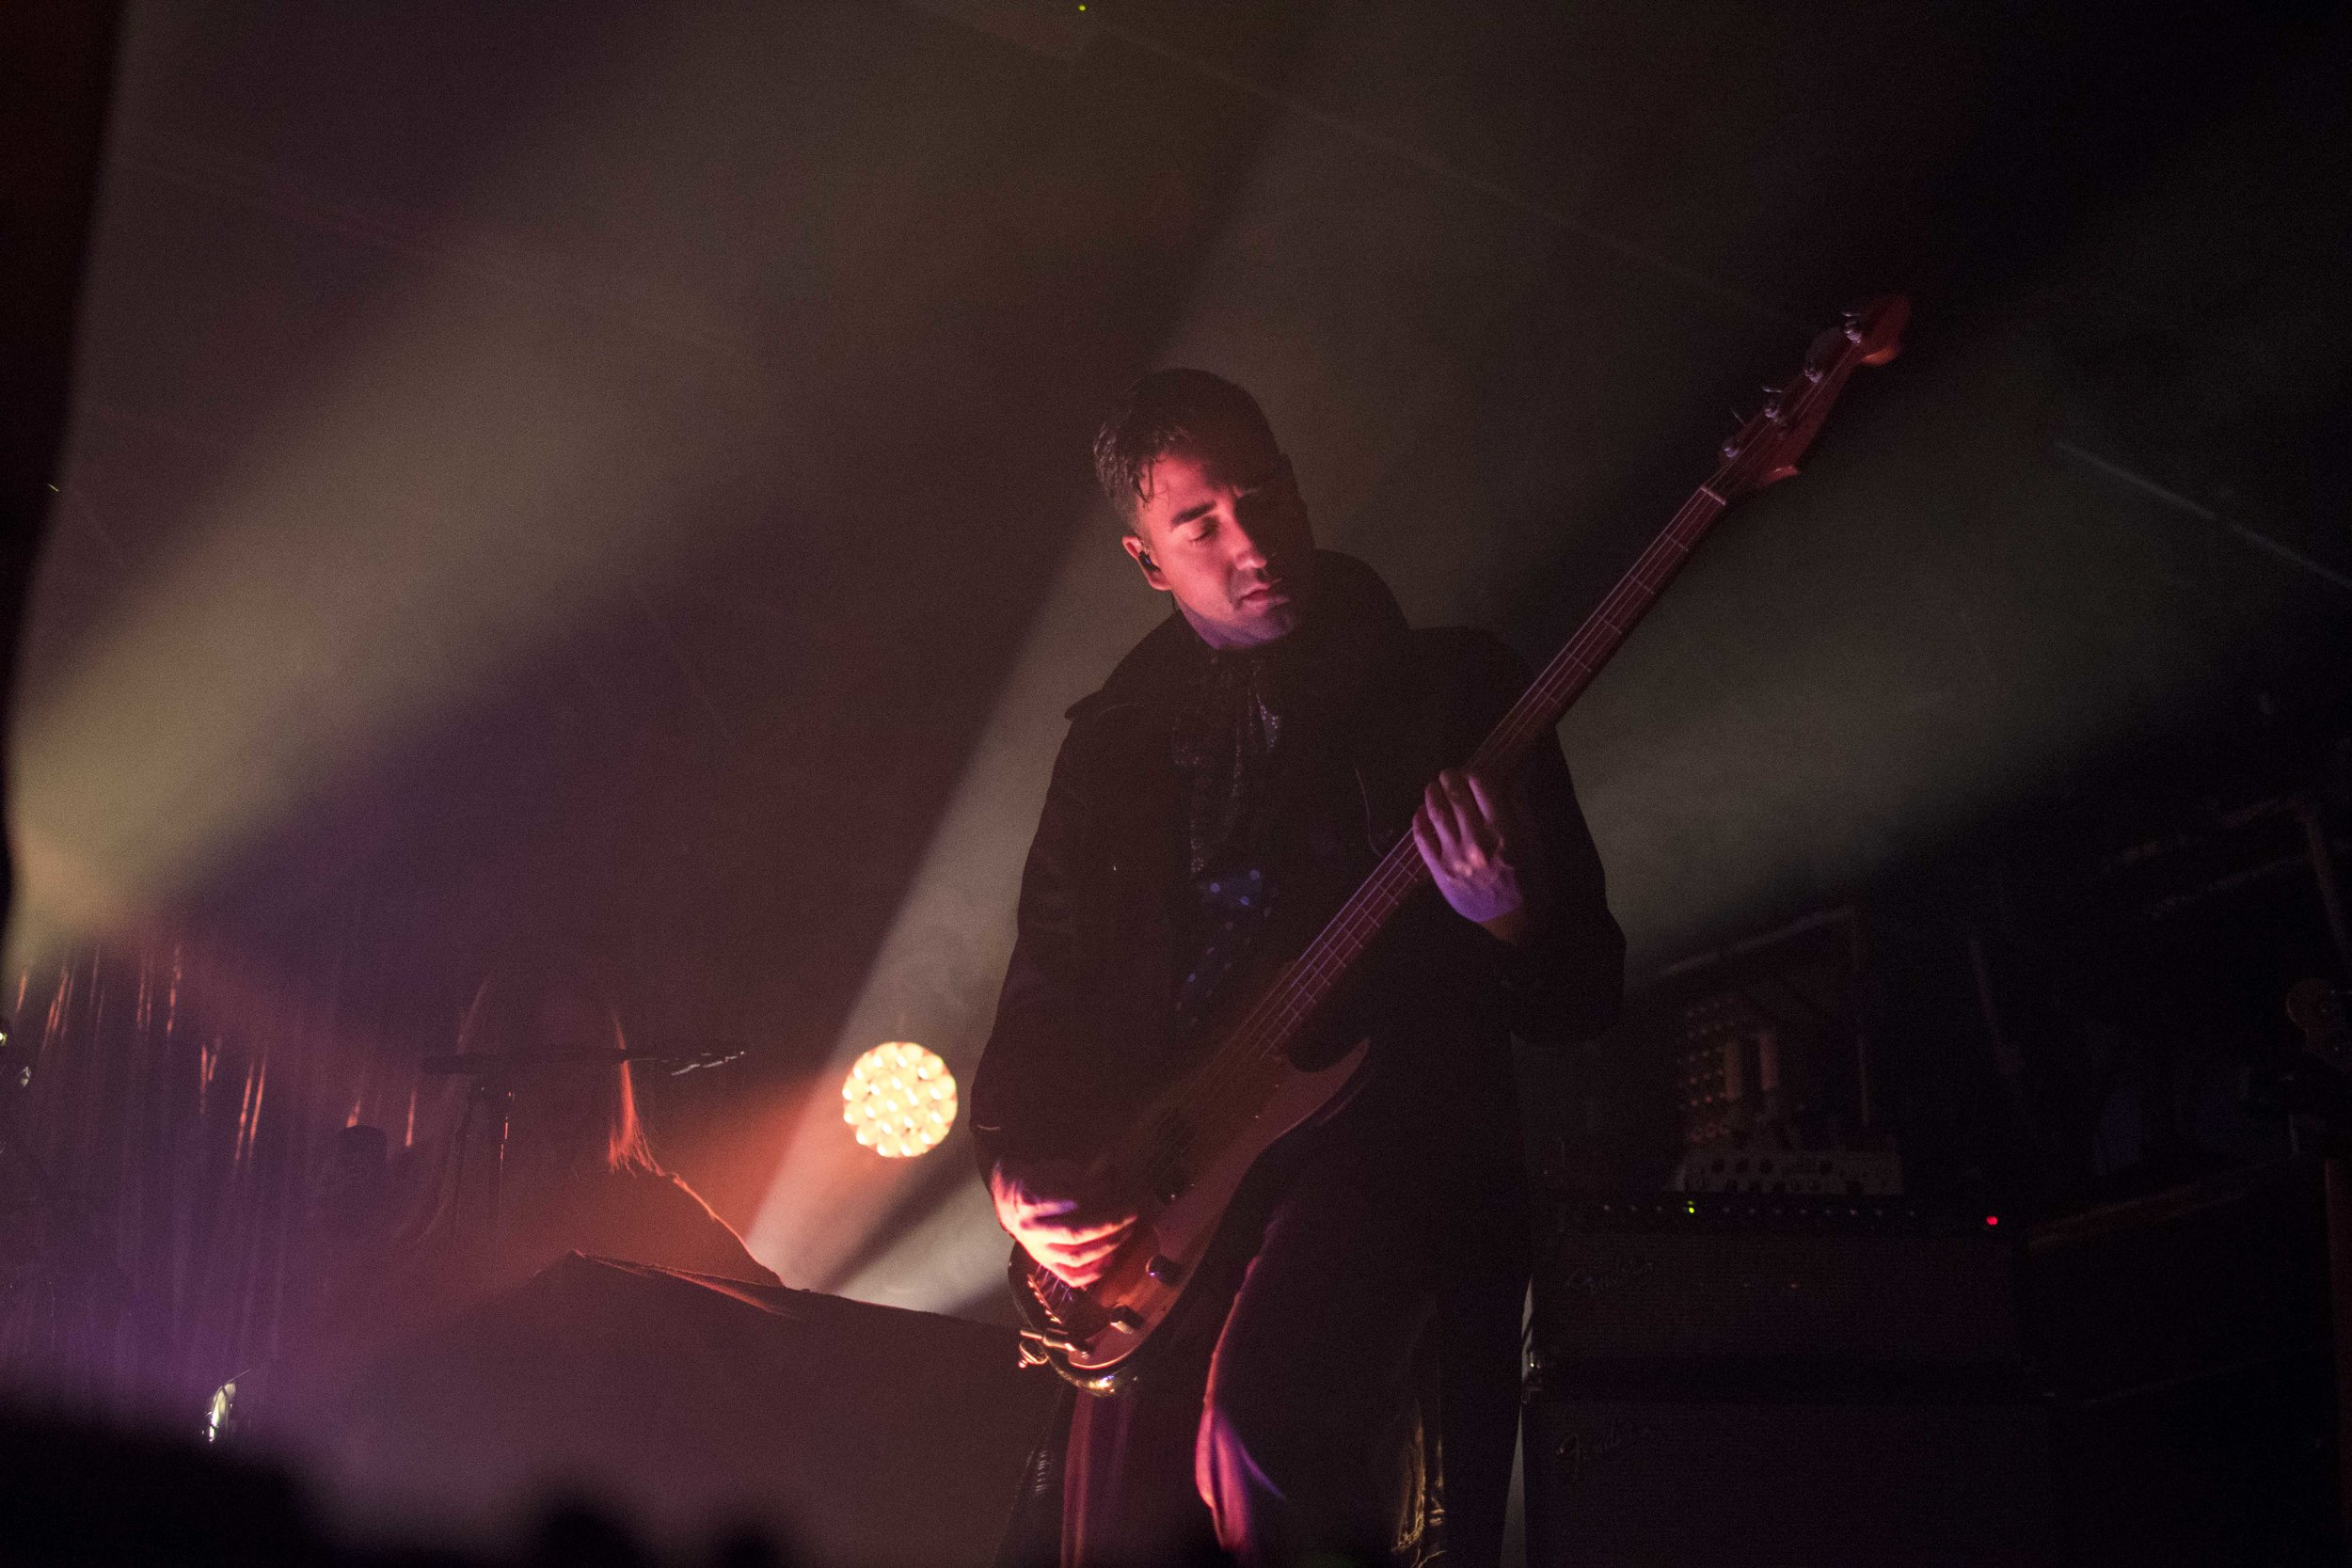 Lord Huron - The Plug - 27-10-2018 - Sheffield 44.jpg